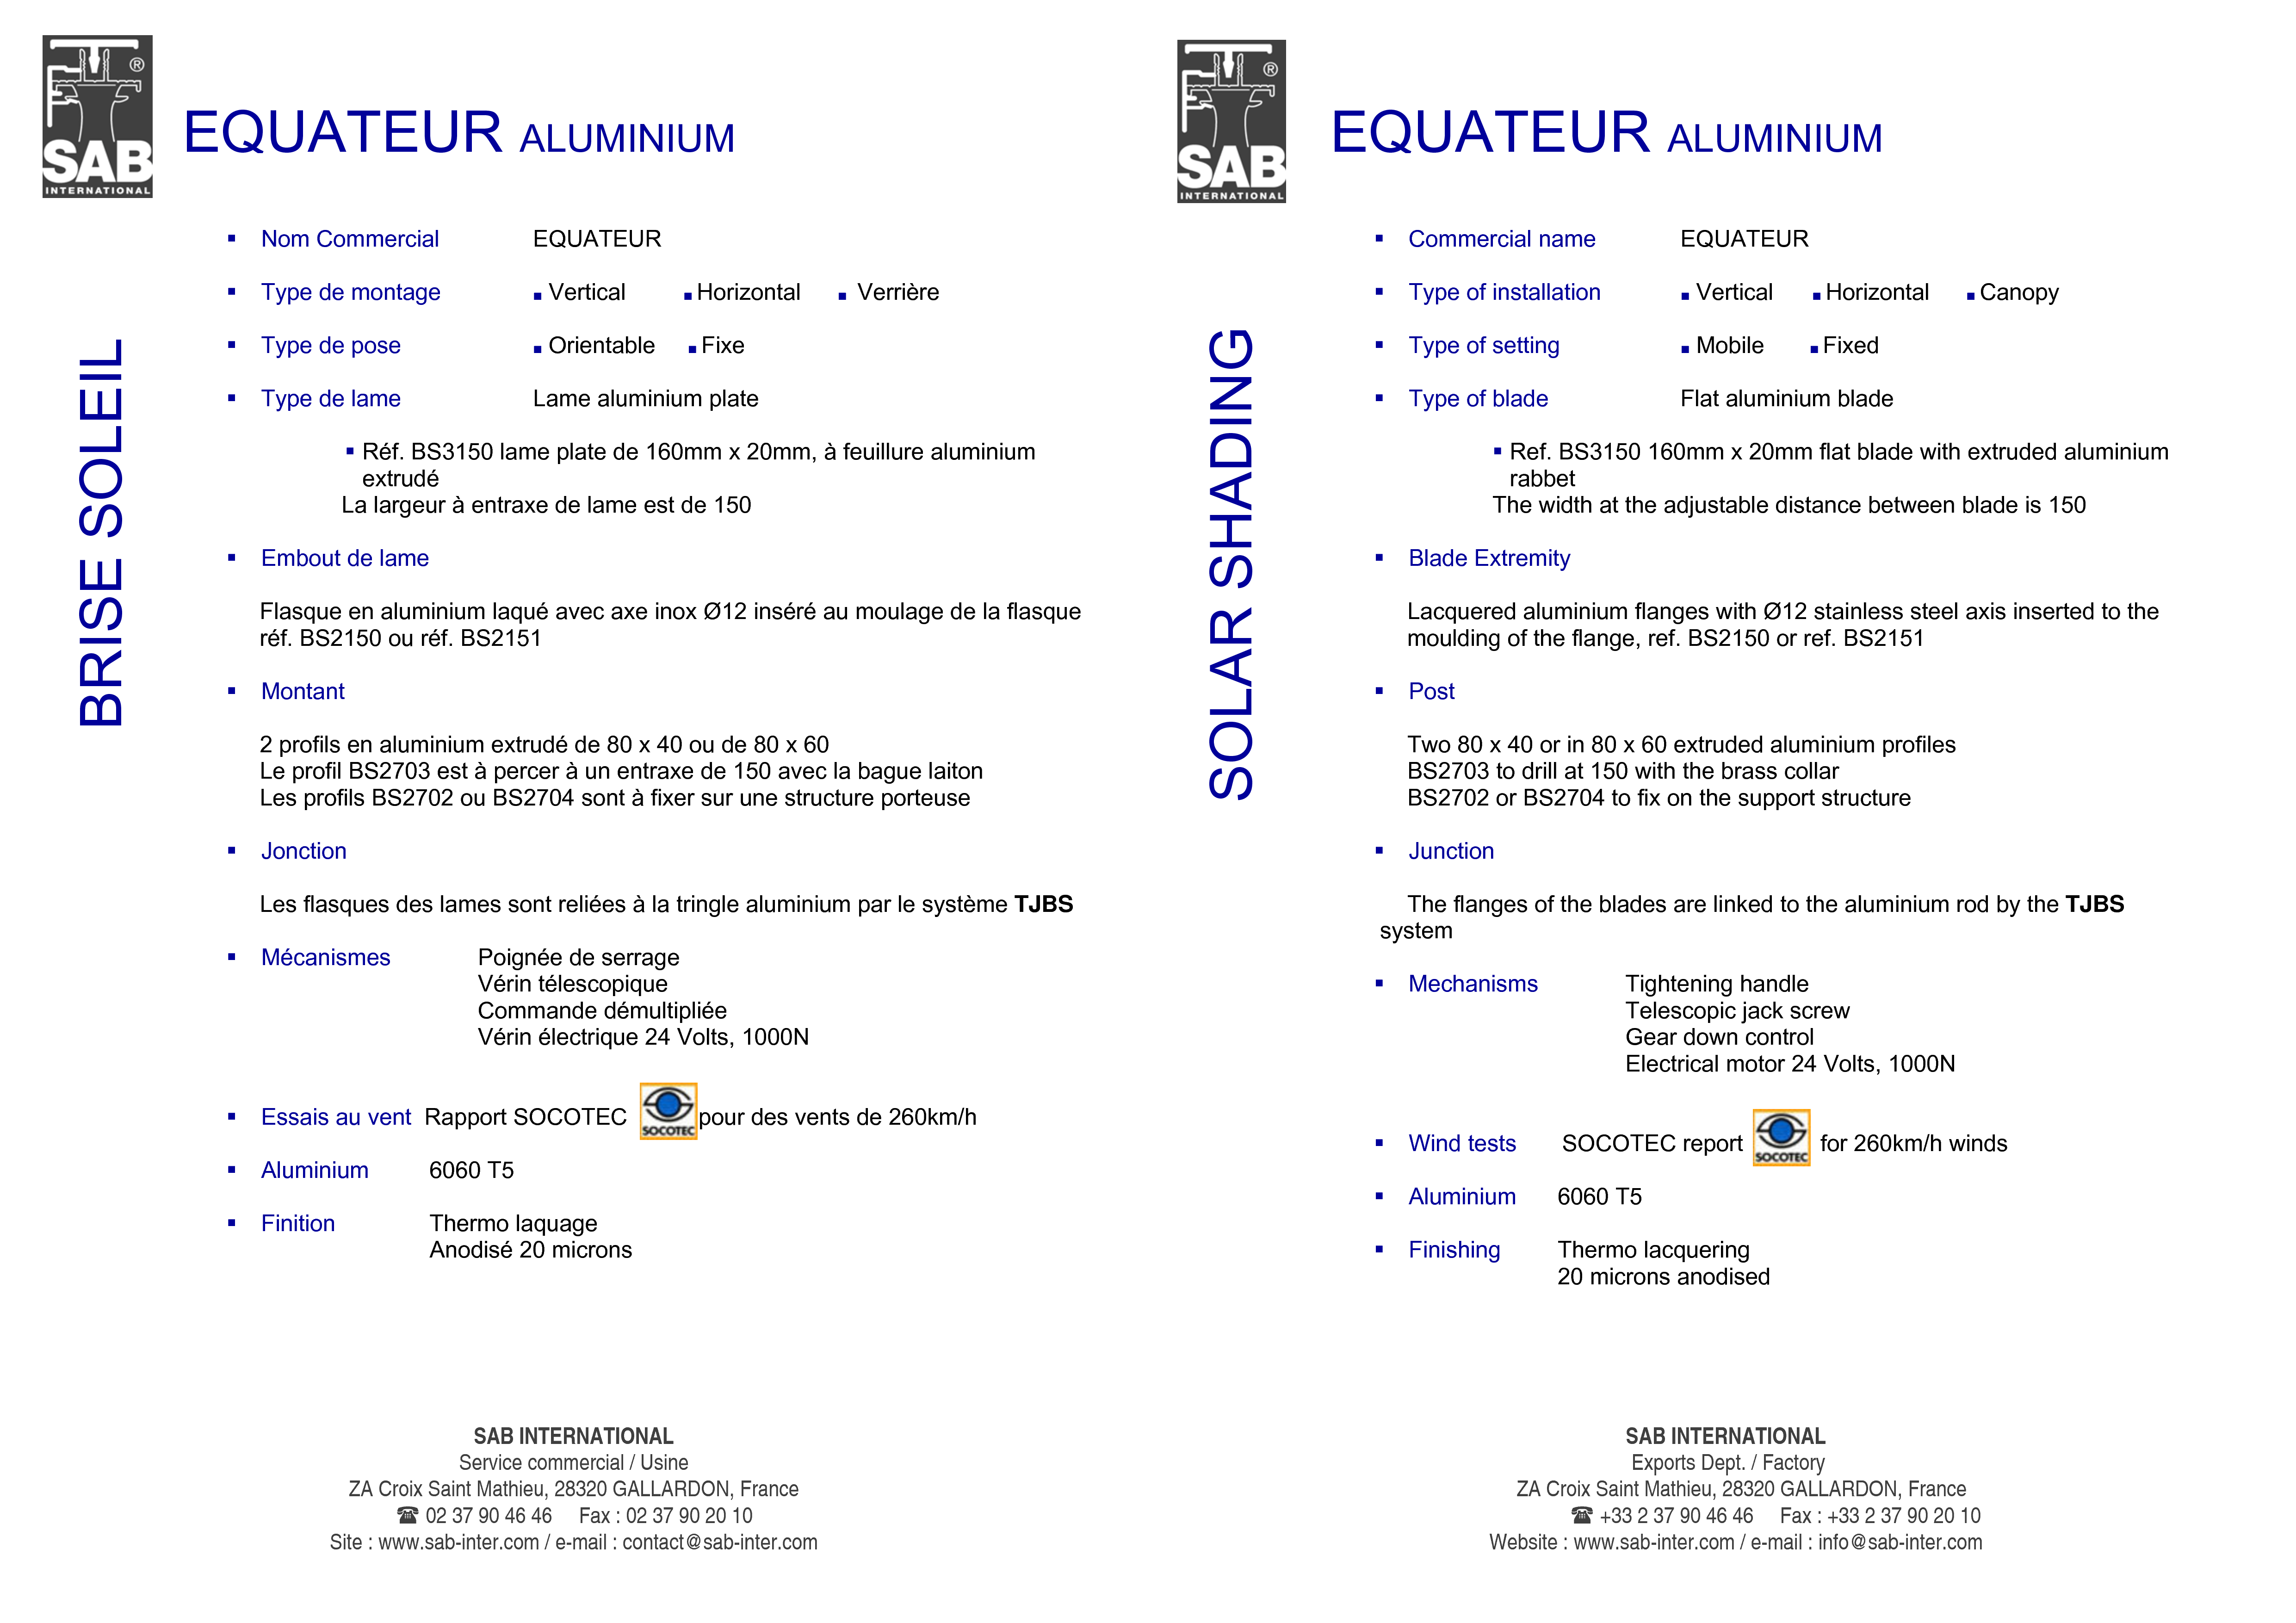 Pagina 4 - CAD-PDF Sisteme de brissoleil-uri din aluminiu SAB Detaliu de produs EQUATEUR